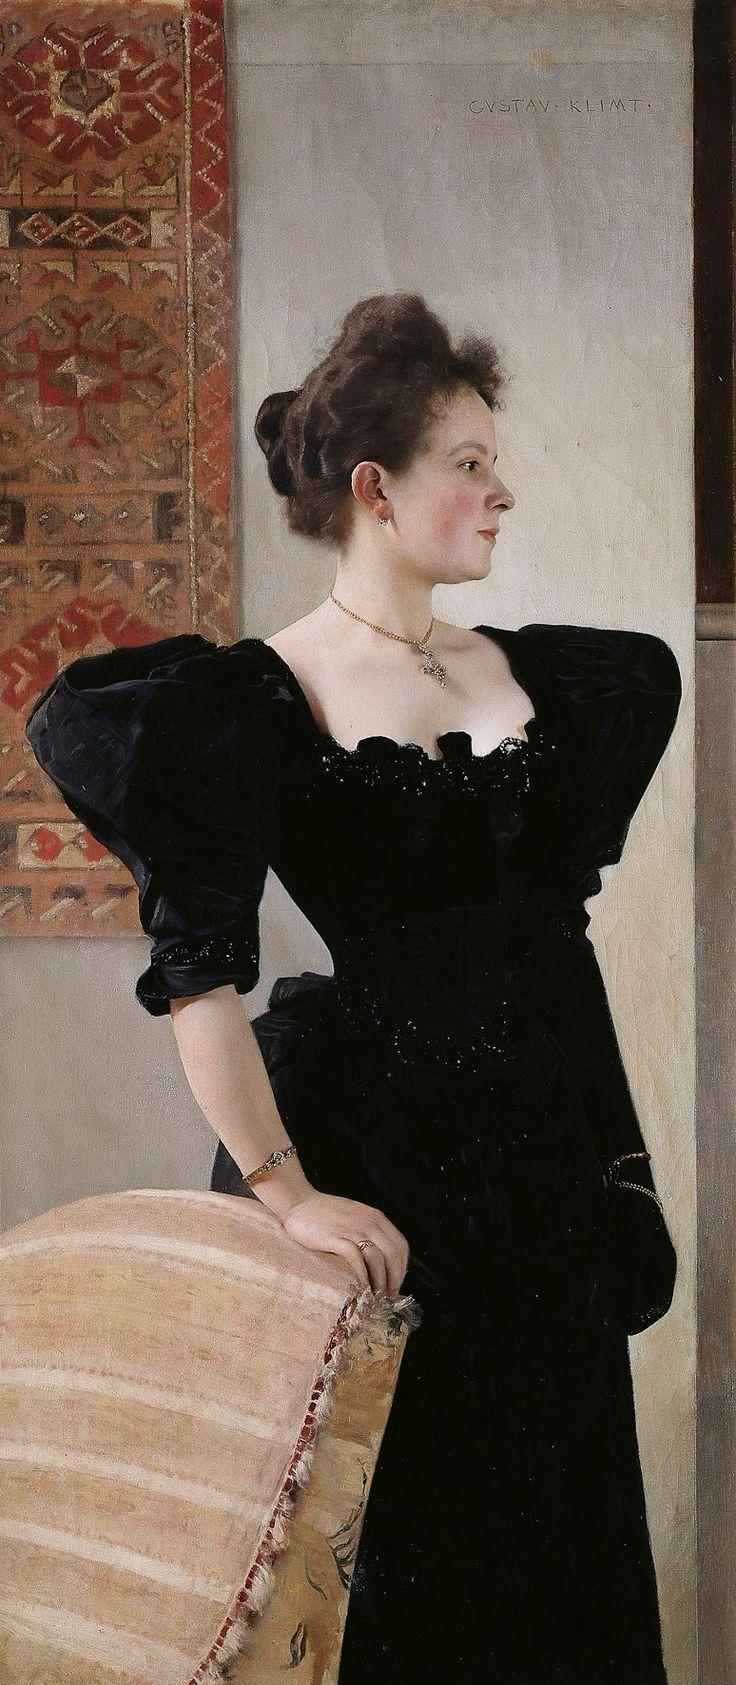 Gustav Klimt, Portrait of Marie Breunig, 1894.